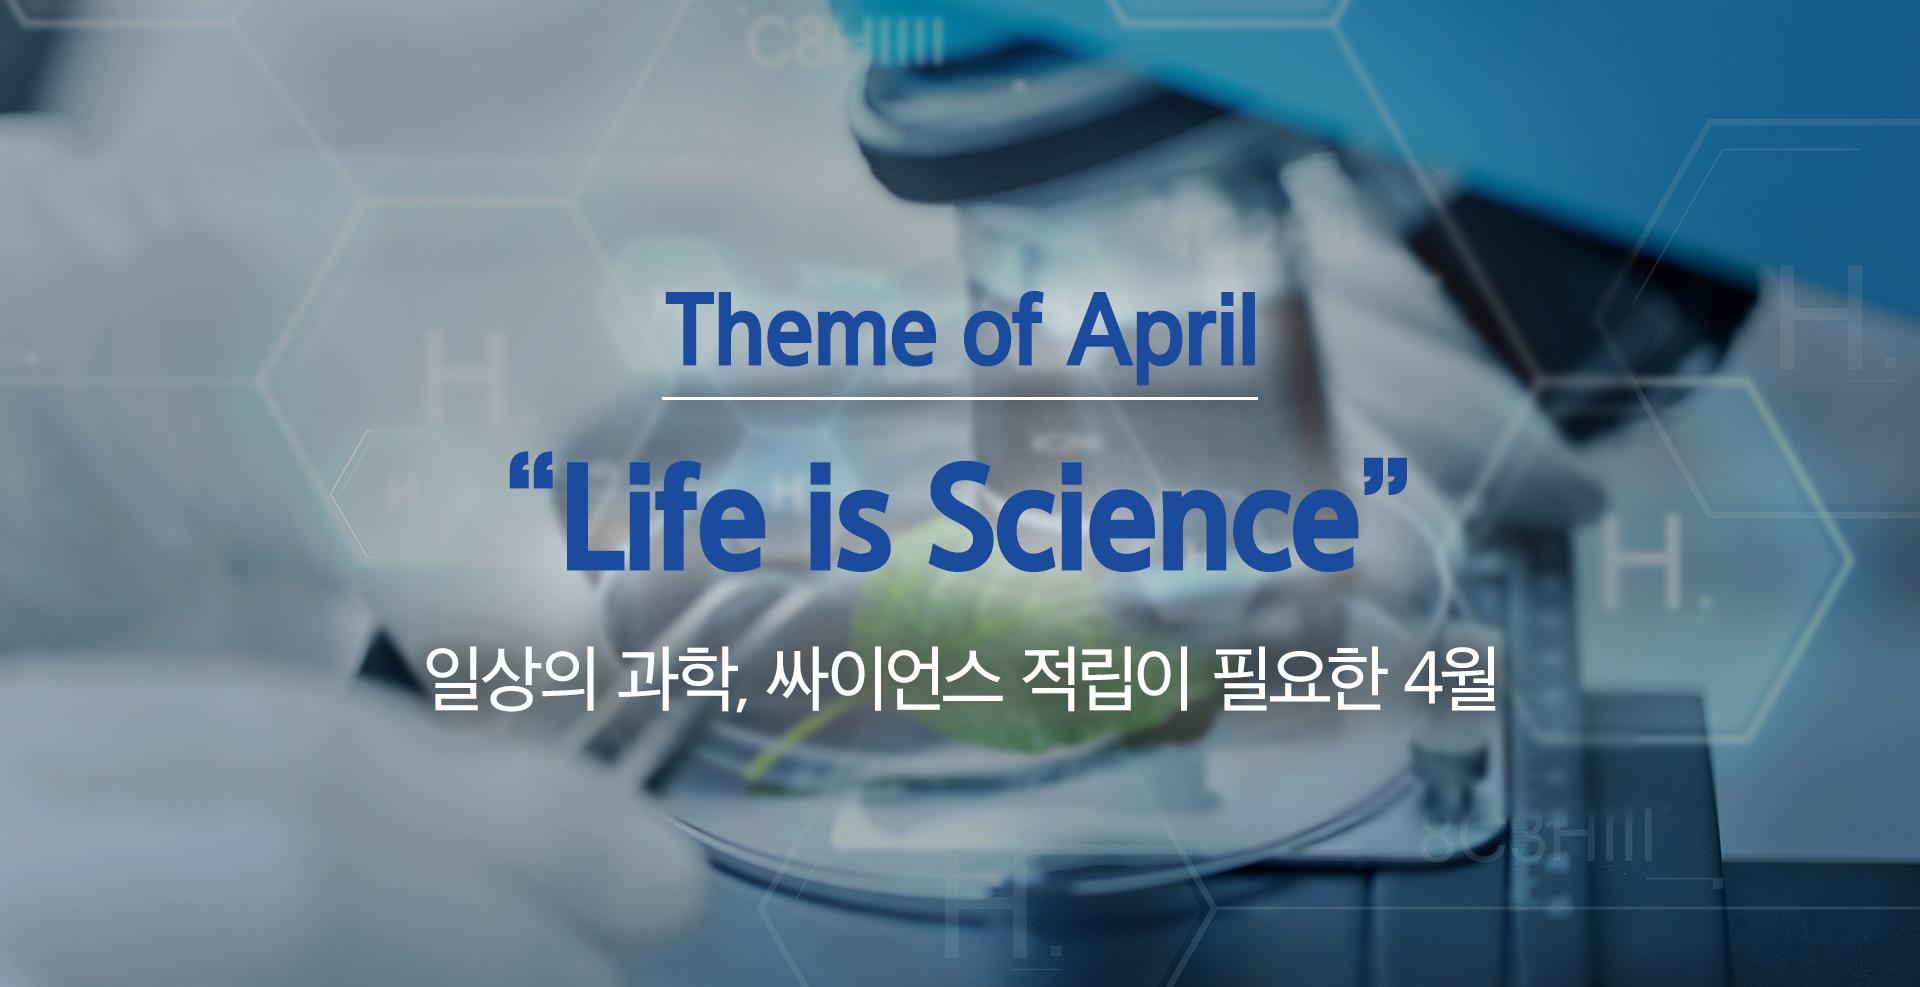 Life is Science 일상의 과학, 싸이언스 적립이 필요한 4월